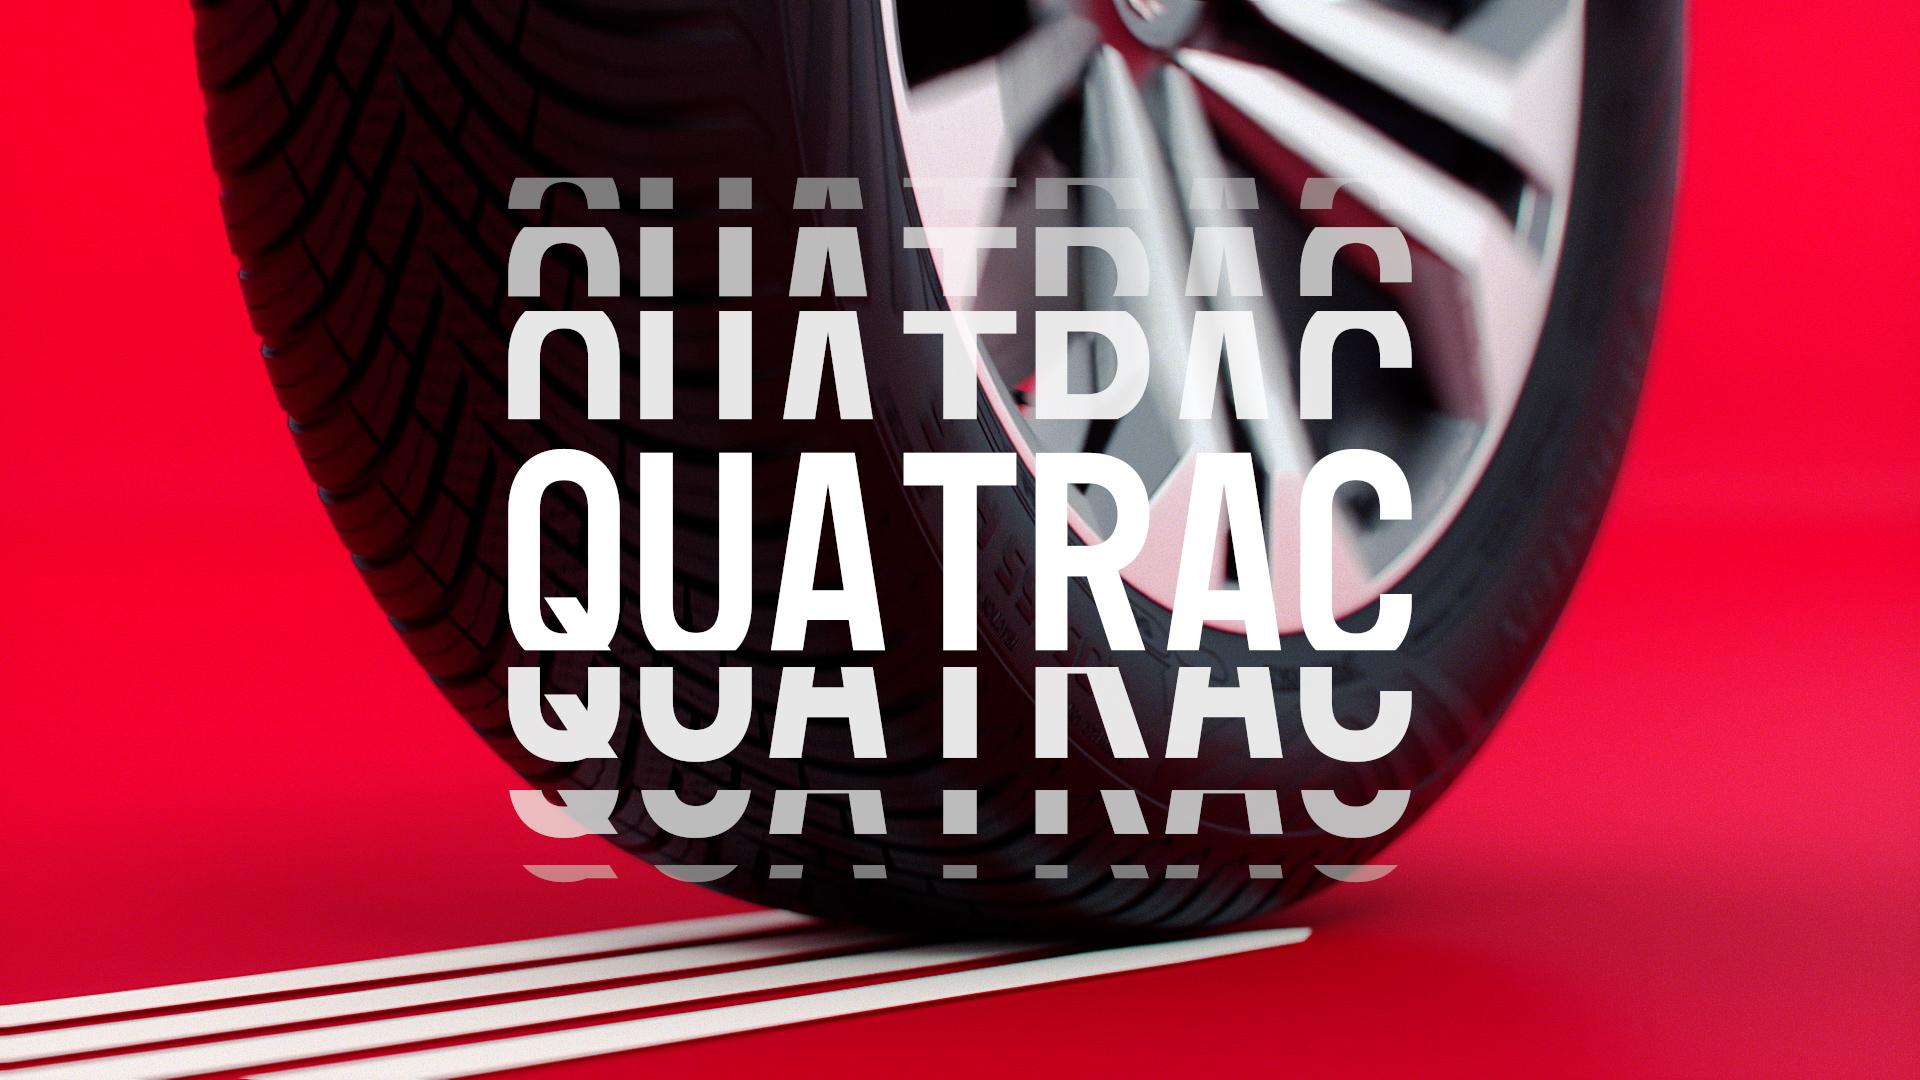 The new QUATRAC - Product Reveal